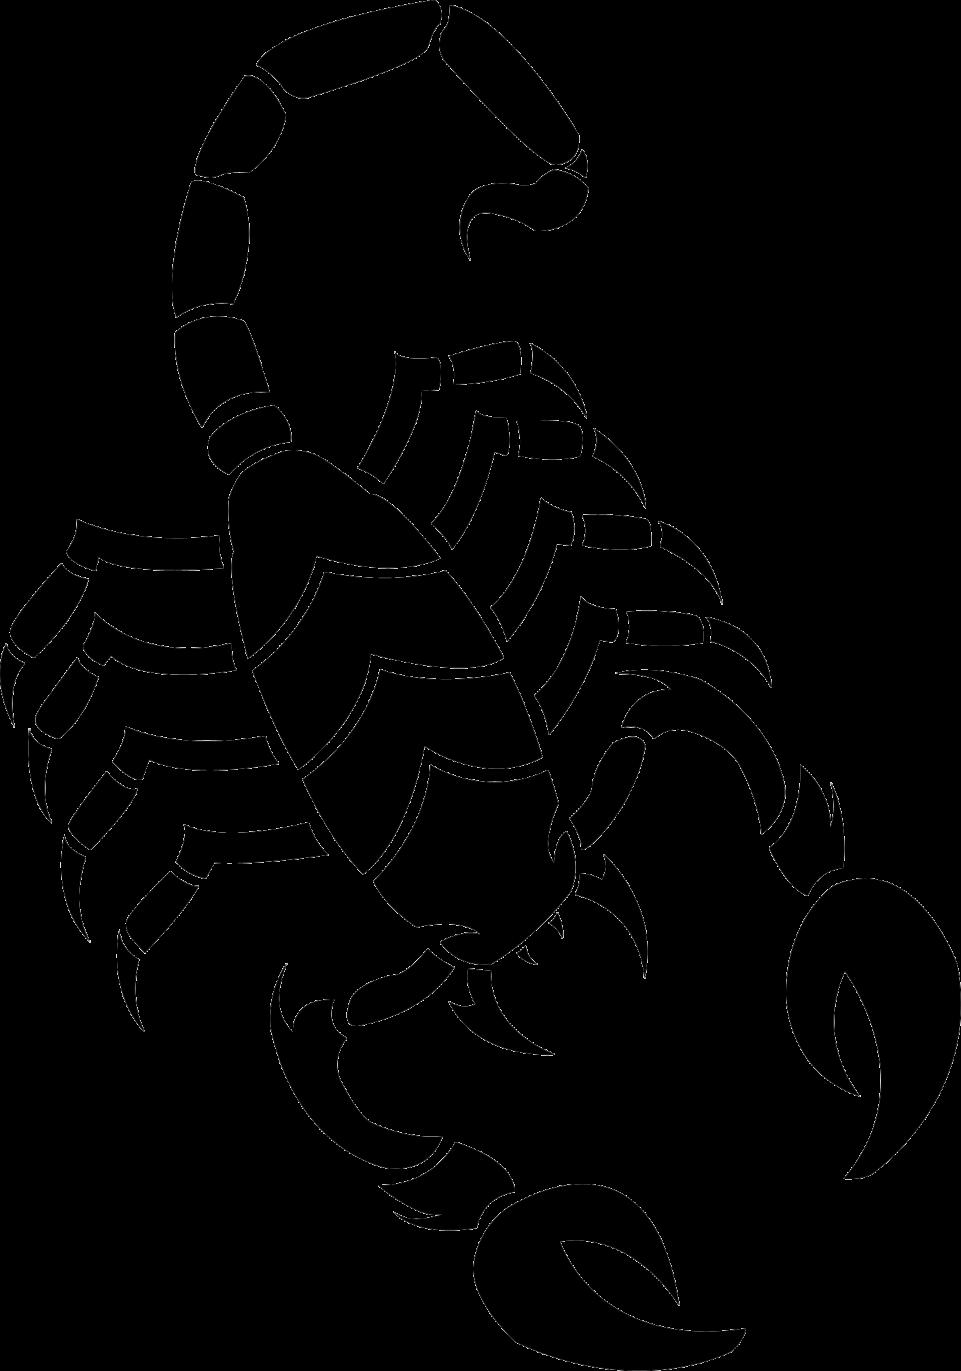 Scorpion PNG Image